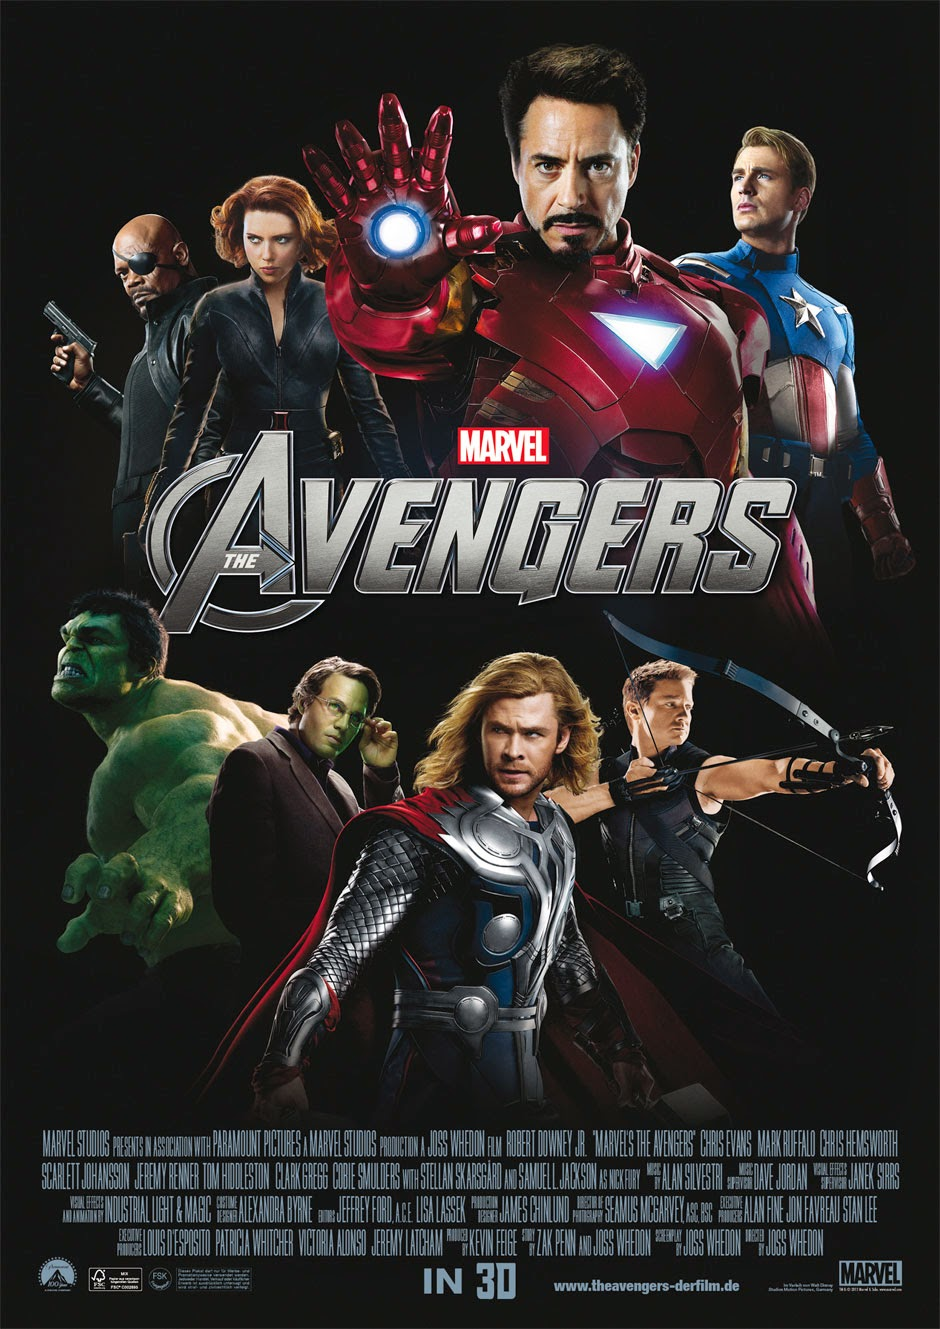 download film the avengers full movie 2012 hd subtitle indonesia sonjayamedia. Black Bedroom Furniture Sets. Home Design Ideas